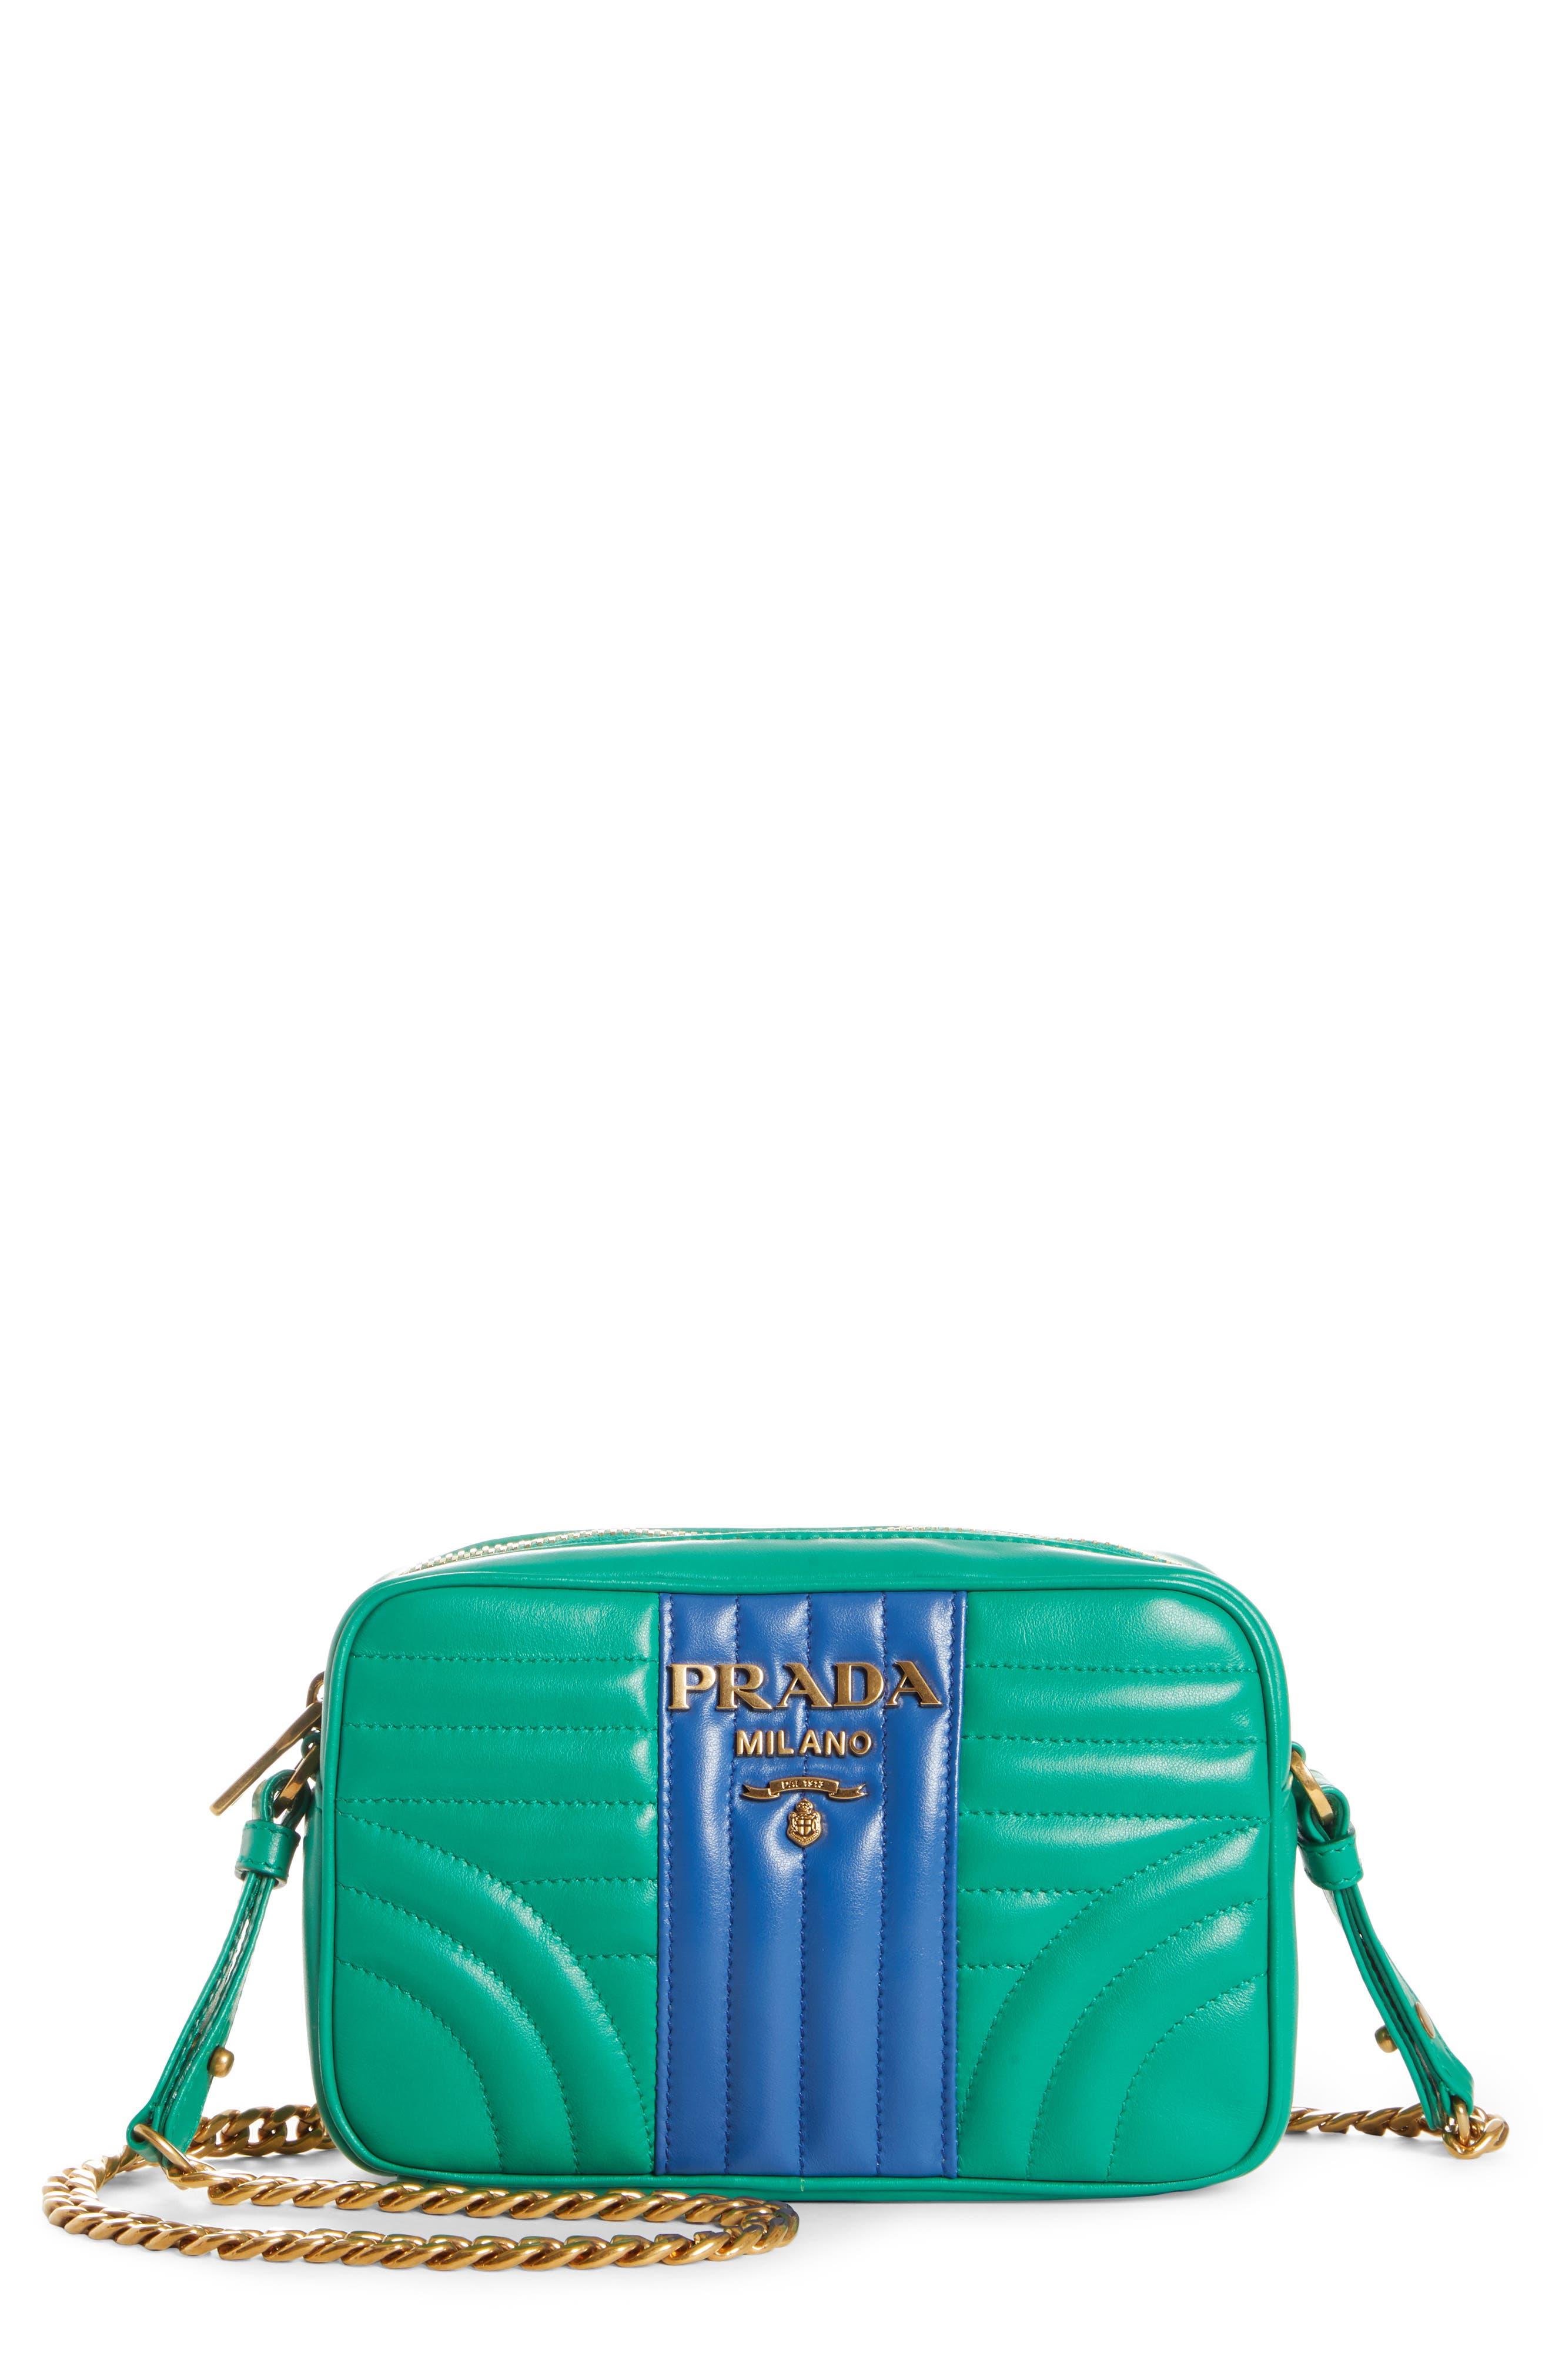 PRADA Diagrammed Colorblock Leather Camera Bag, Main, color, MANGO/ AZZURRO